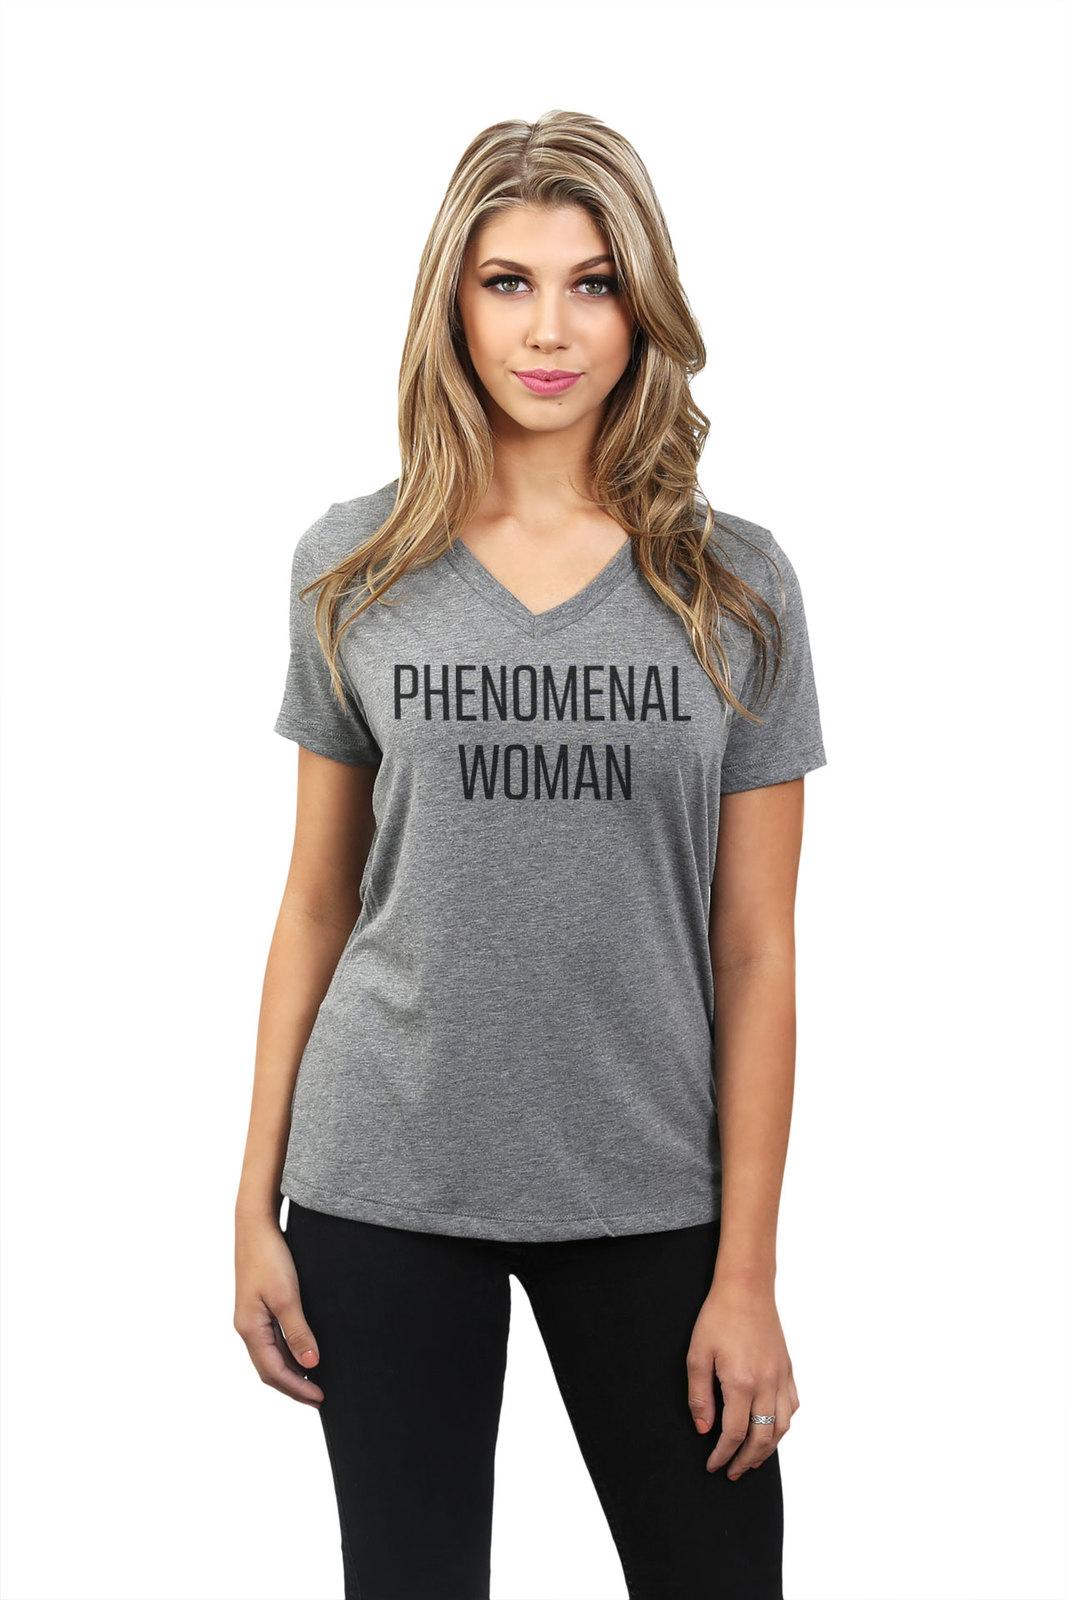 Thread Tank Phenomenal Woman Women's Relaxed V-Neck T-Shirt Tee Heather Grey